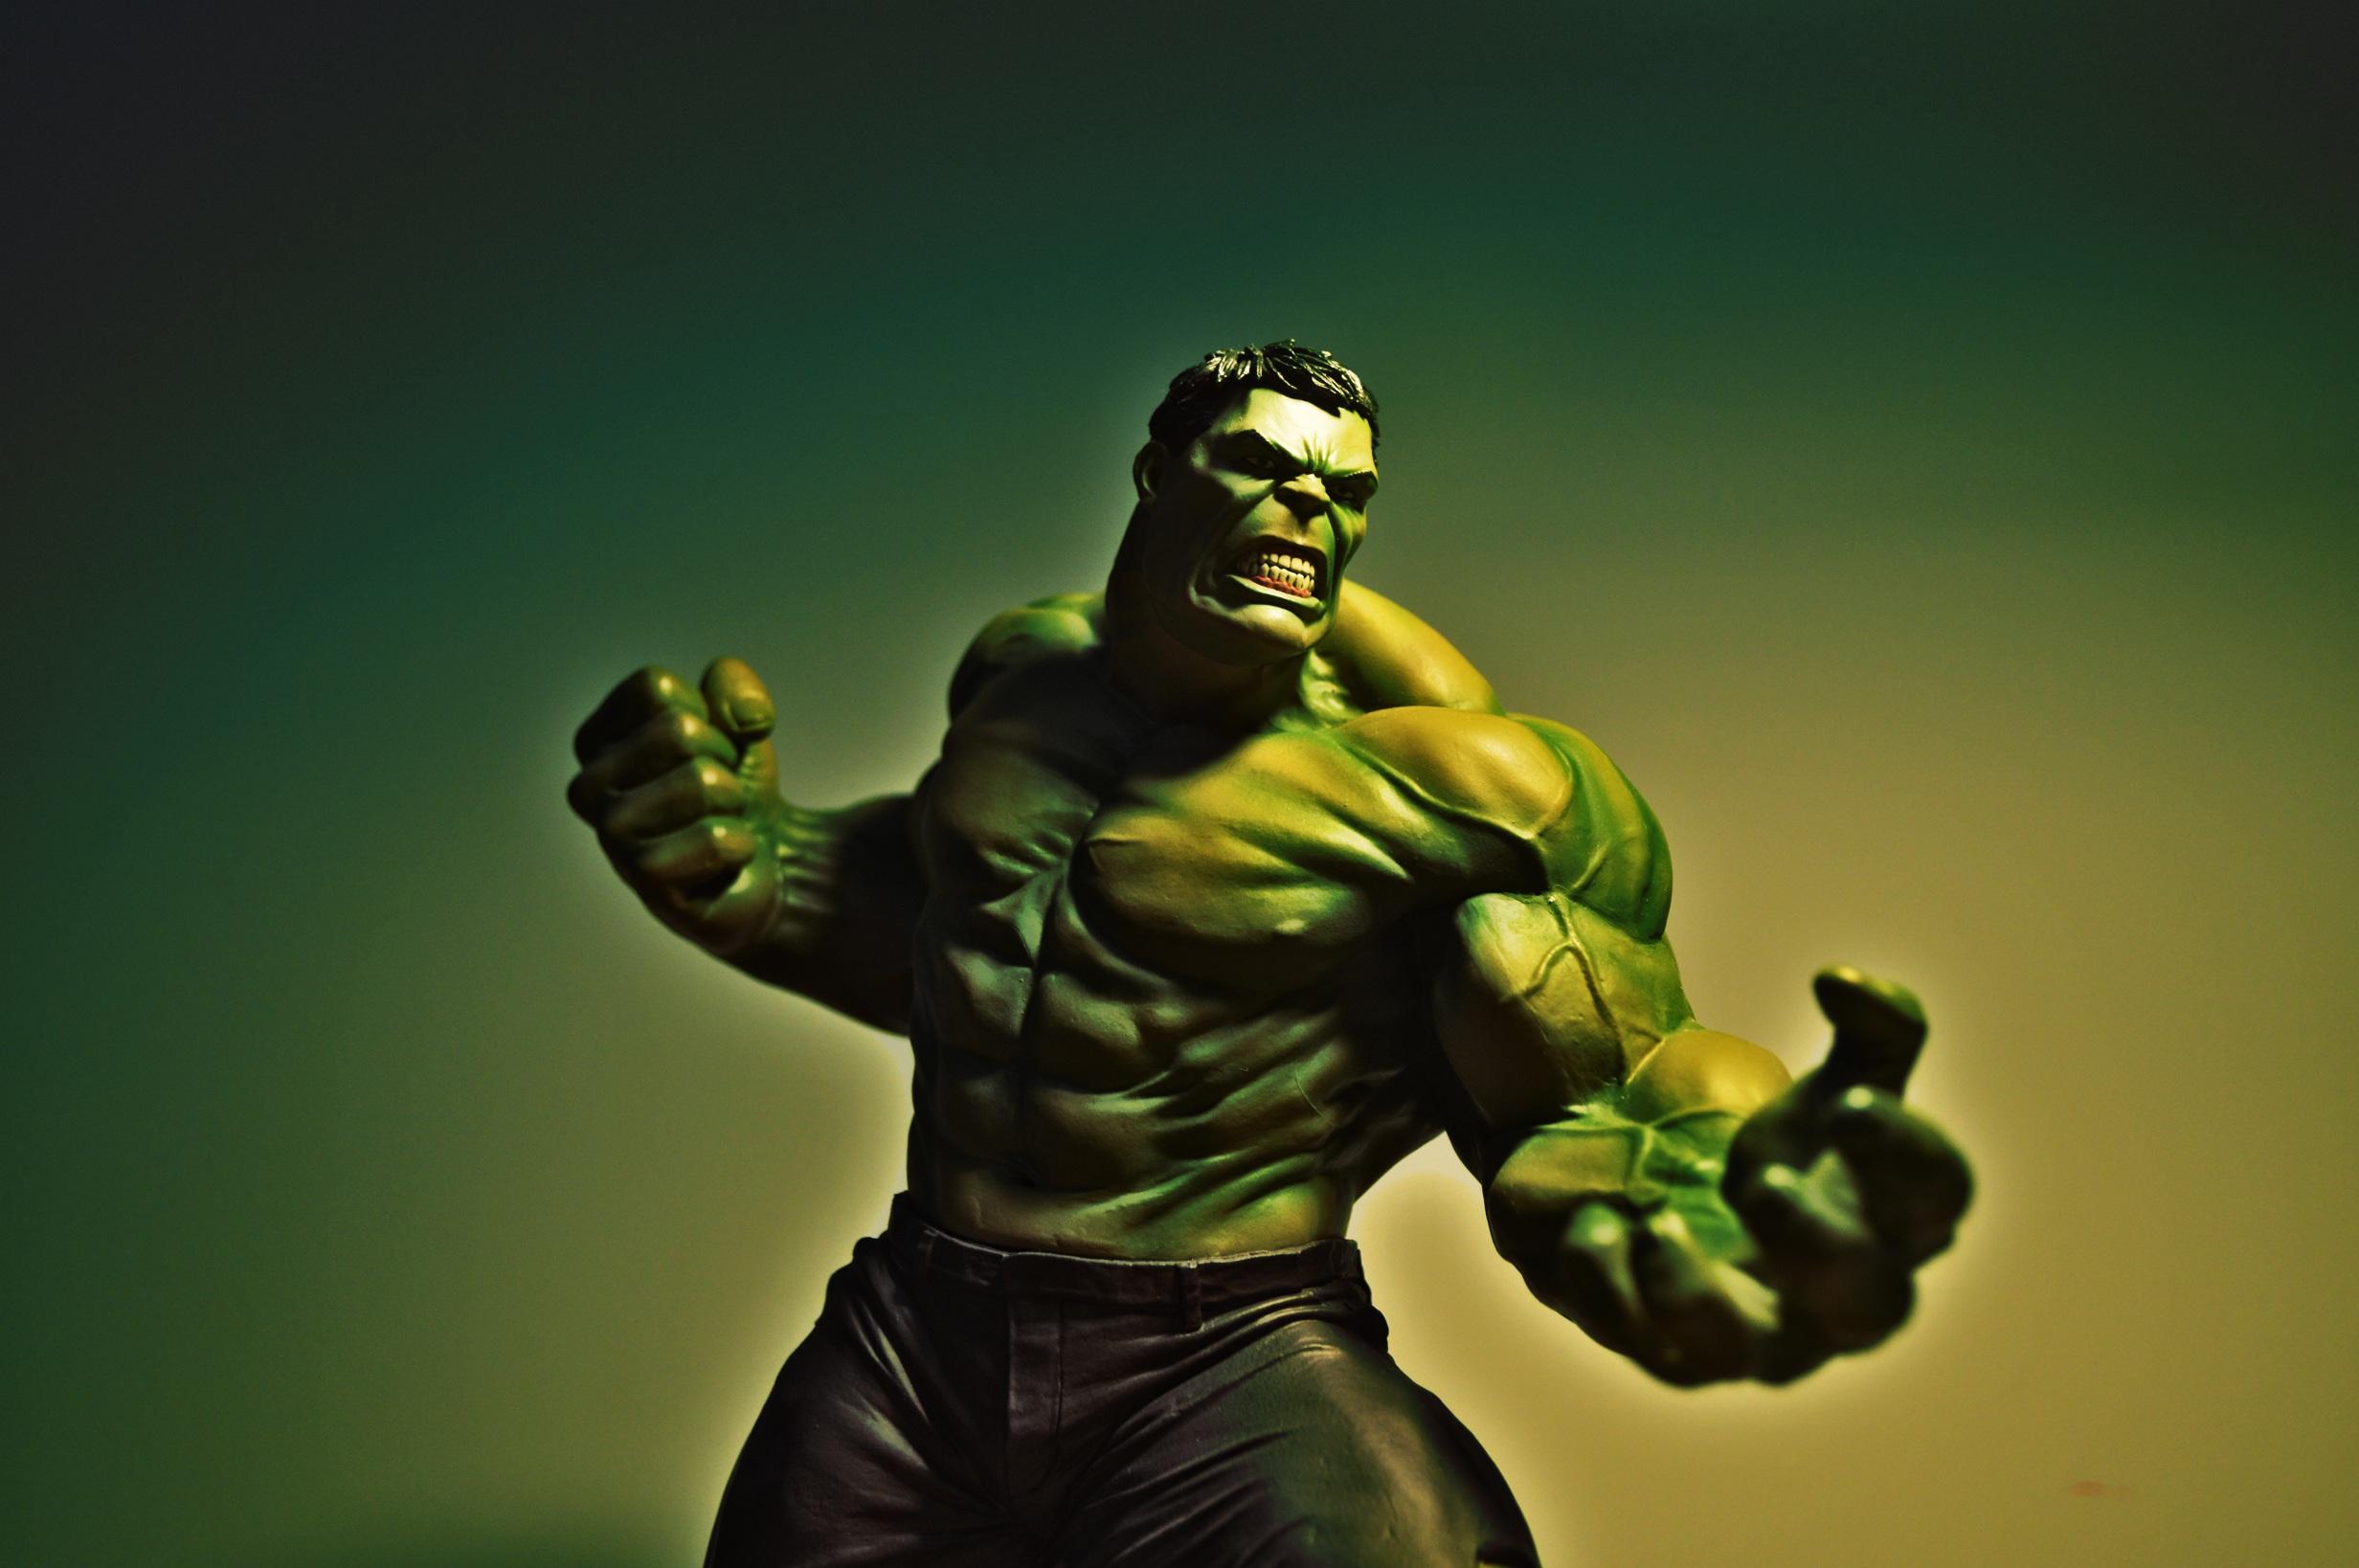 Hulk, Marvel, supereroe, forza, muscoli - Sfondi HD - Professor-falken.com